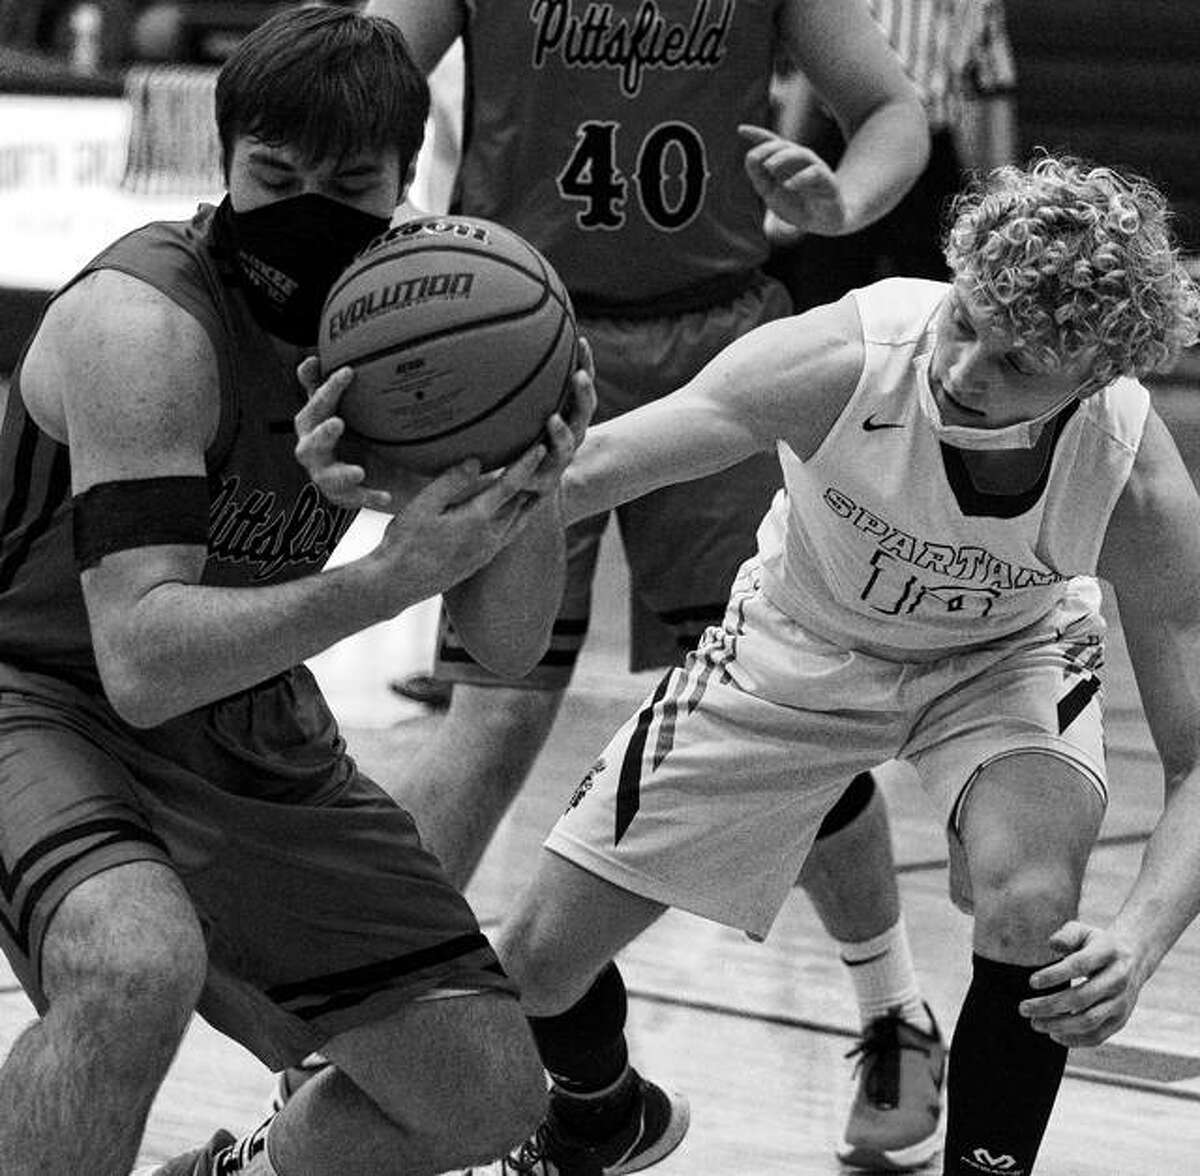 North Greene's Levi Ballard reaches in on Pittsfield's Carter Klatt during a varsity boys' basketball game at White Hall Tuesday night.